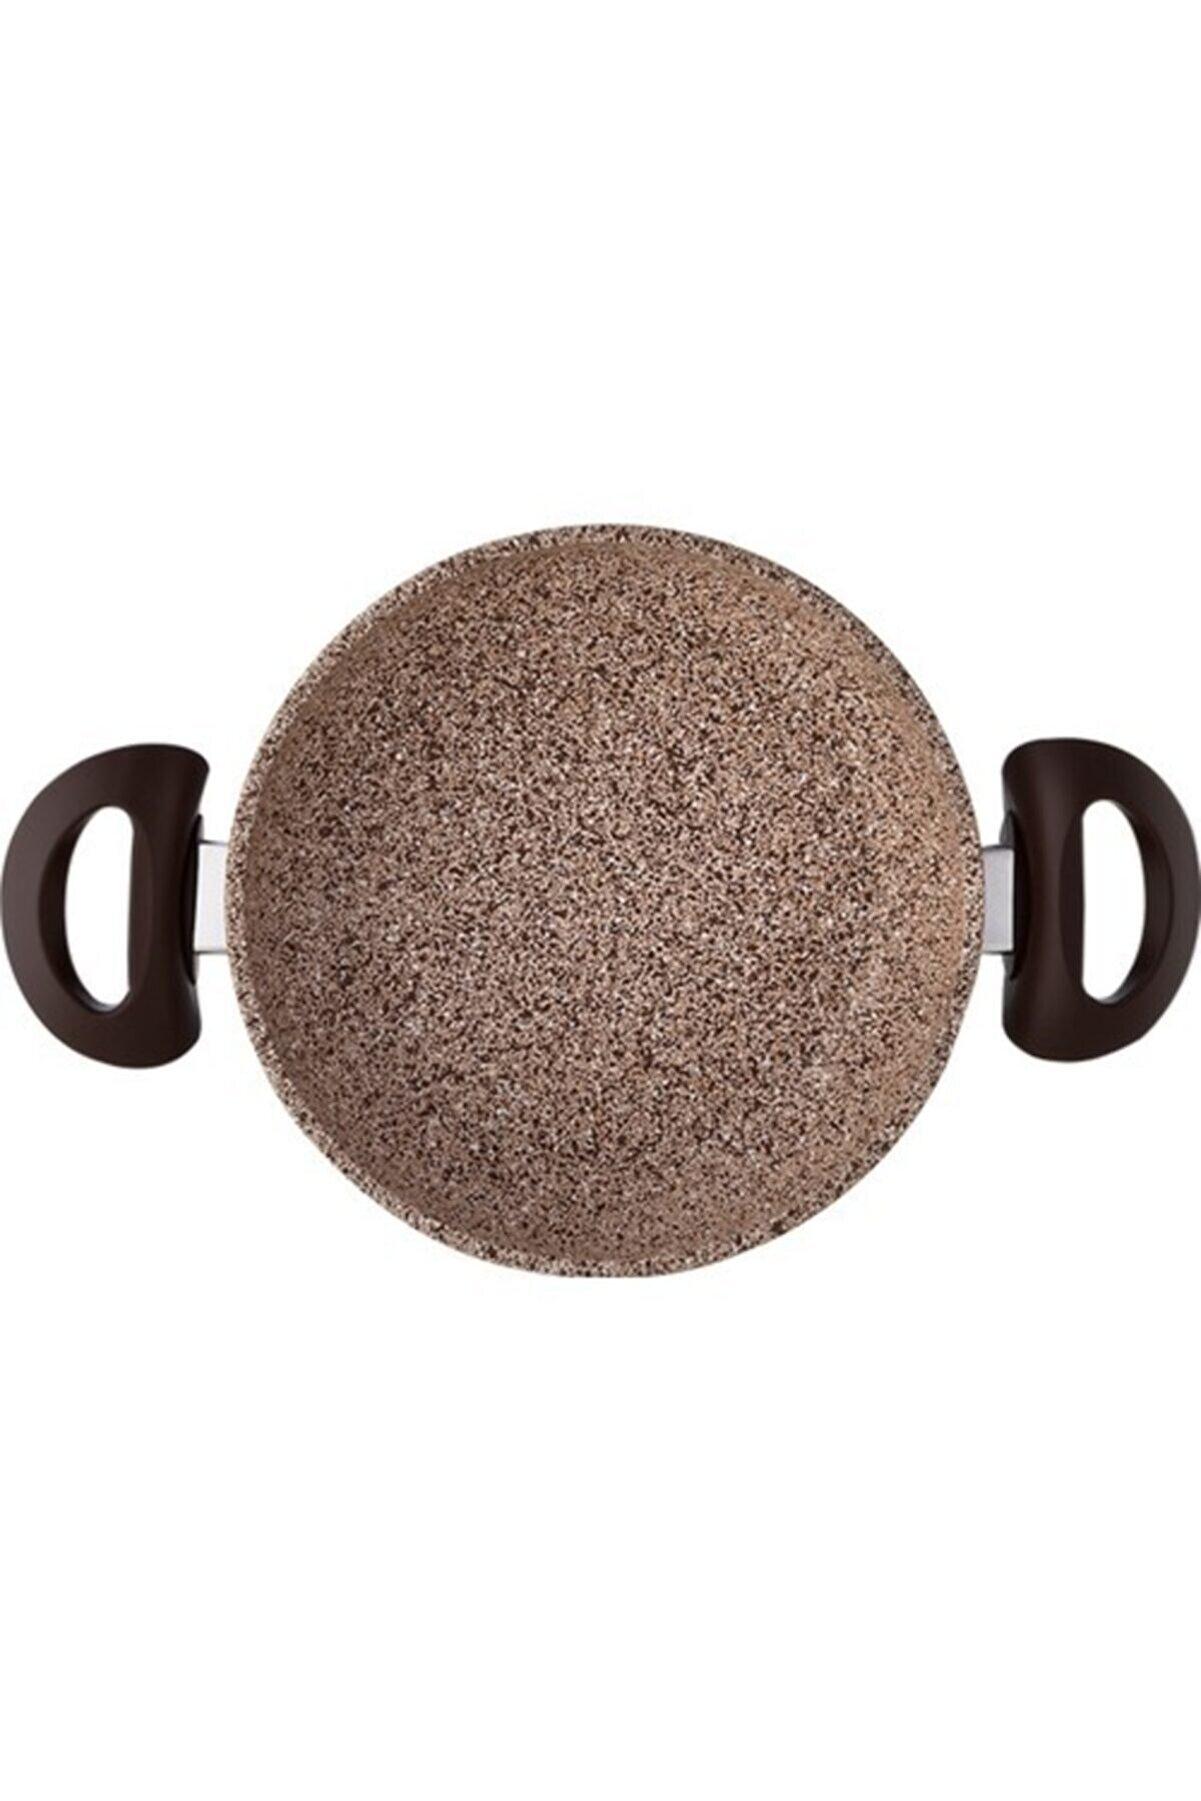 Falez Creamy Granitec Omlet-sahan 22 Cm